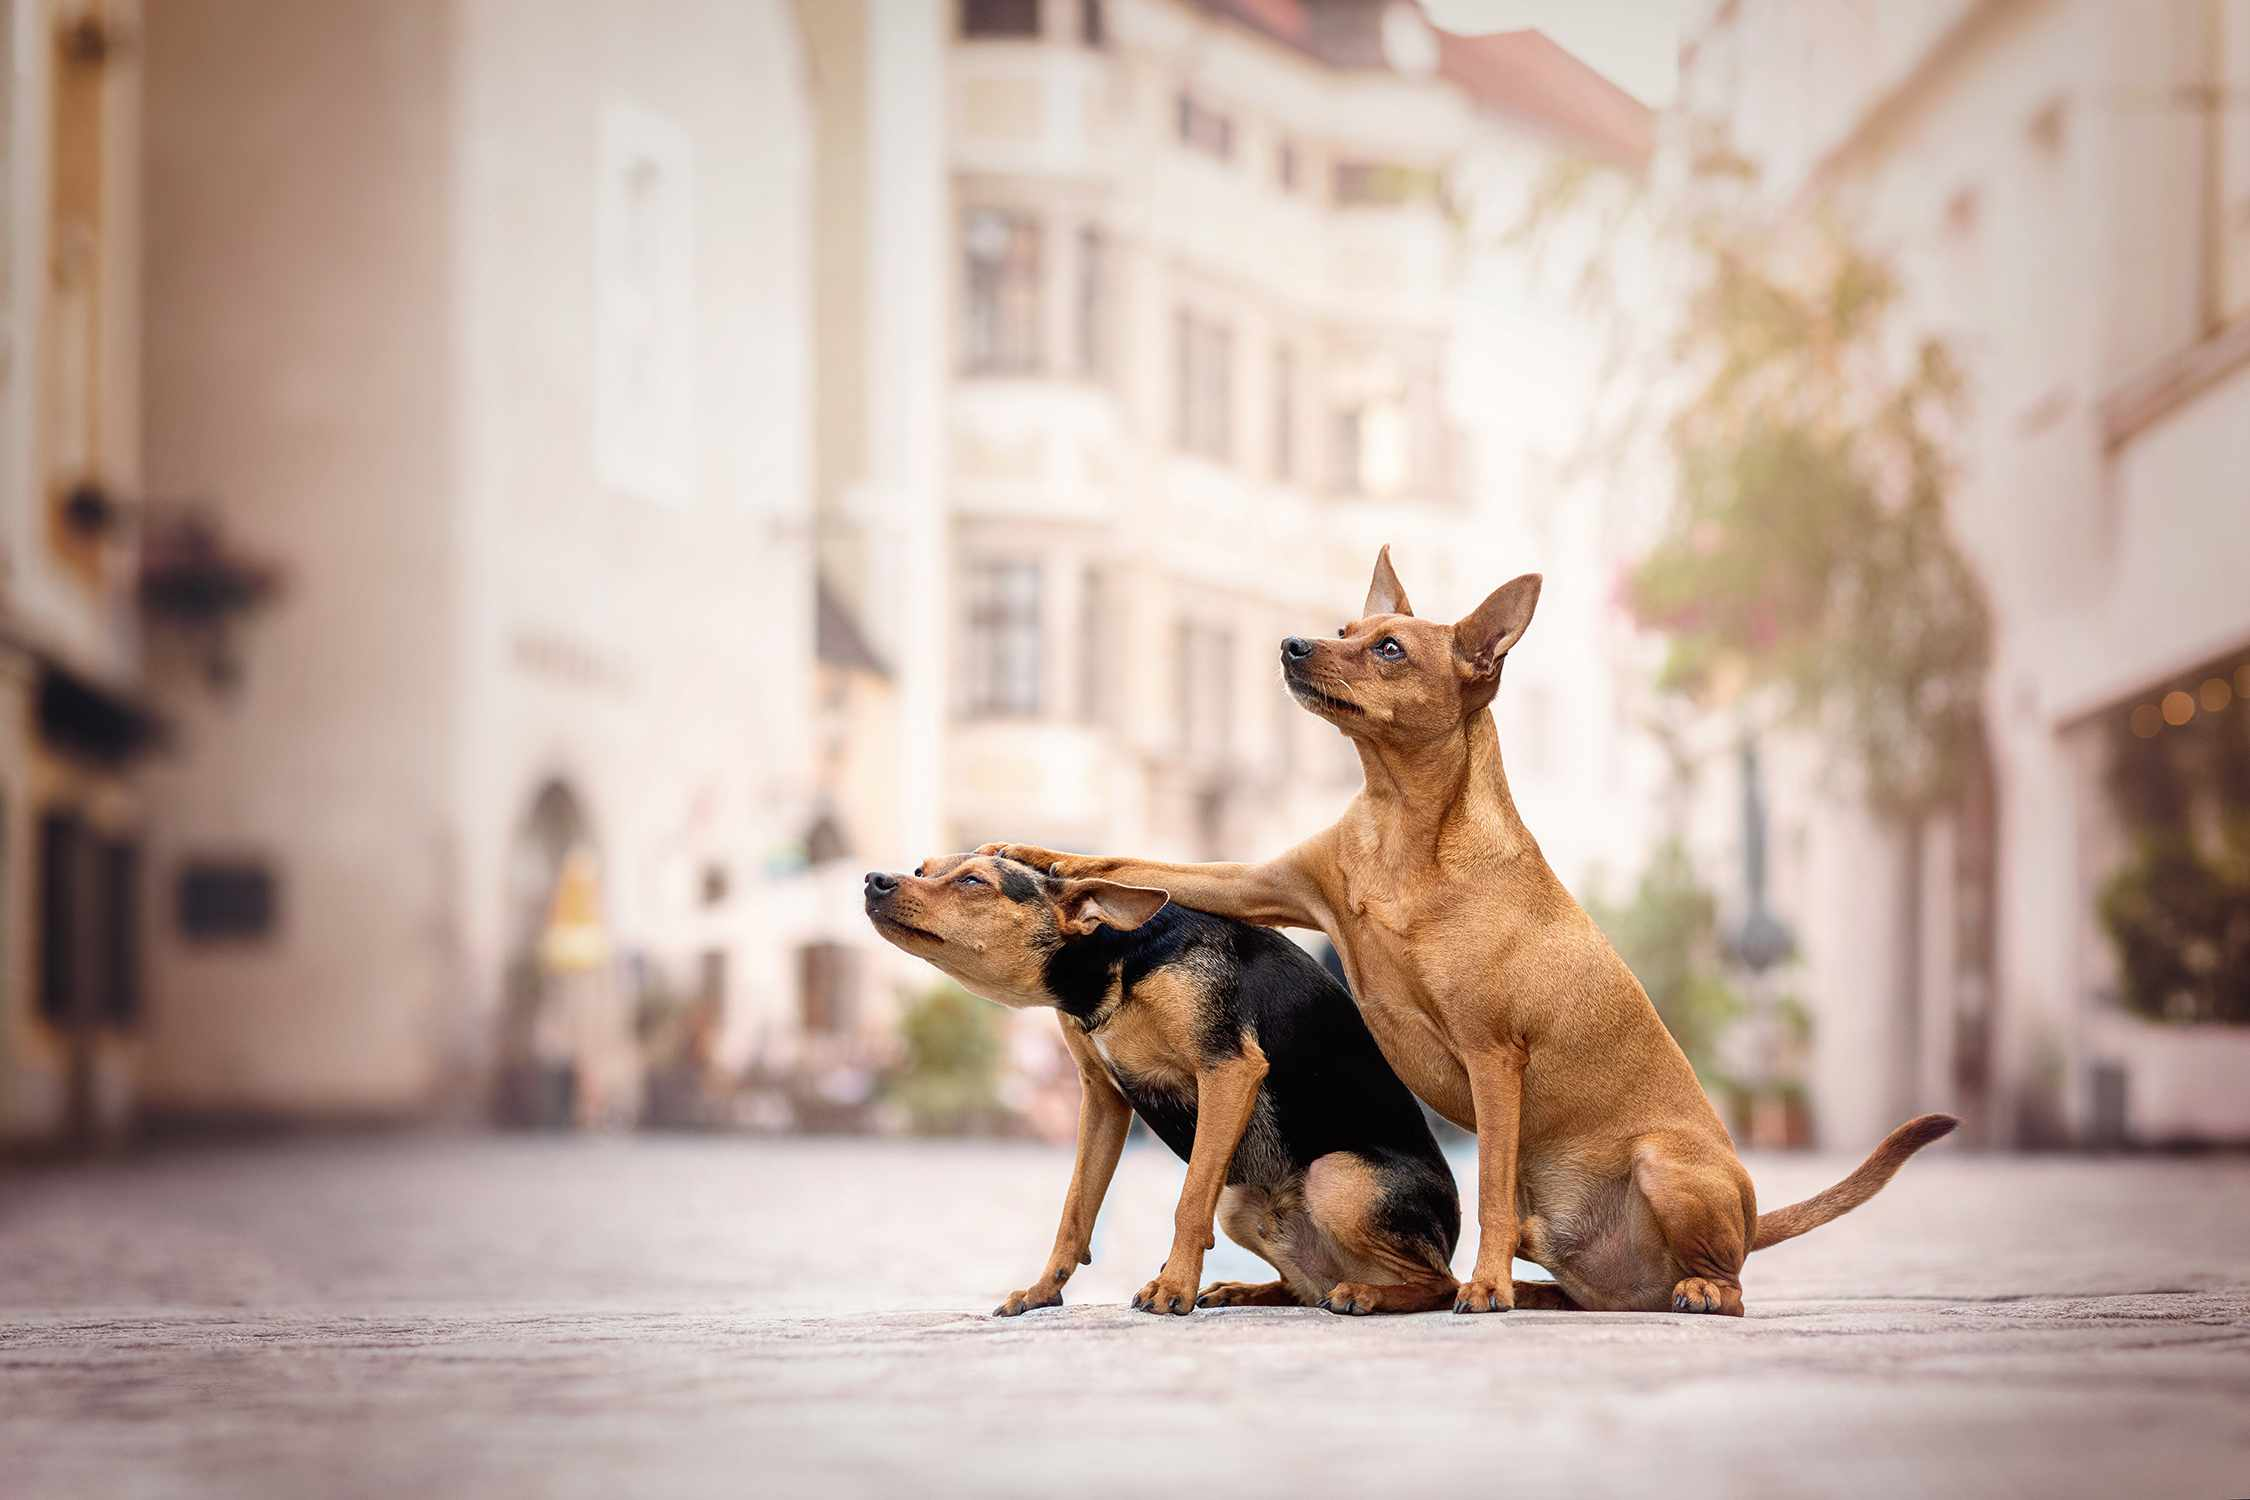 dog patting dog on head